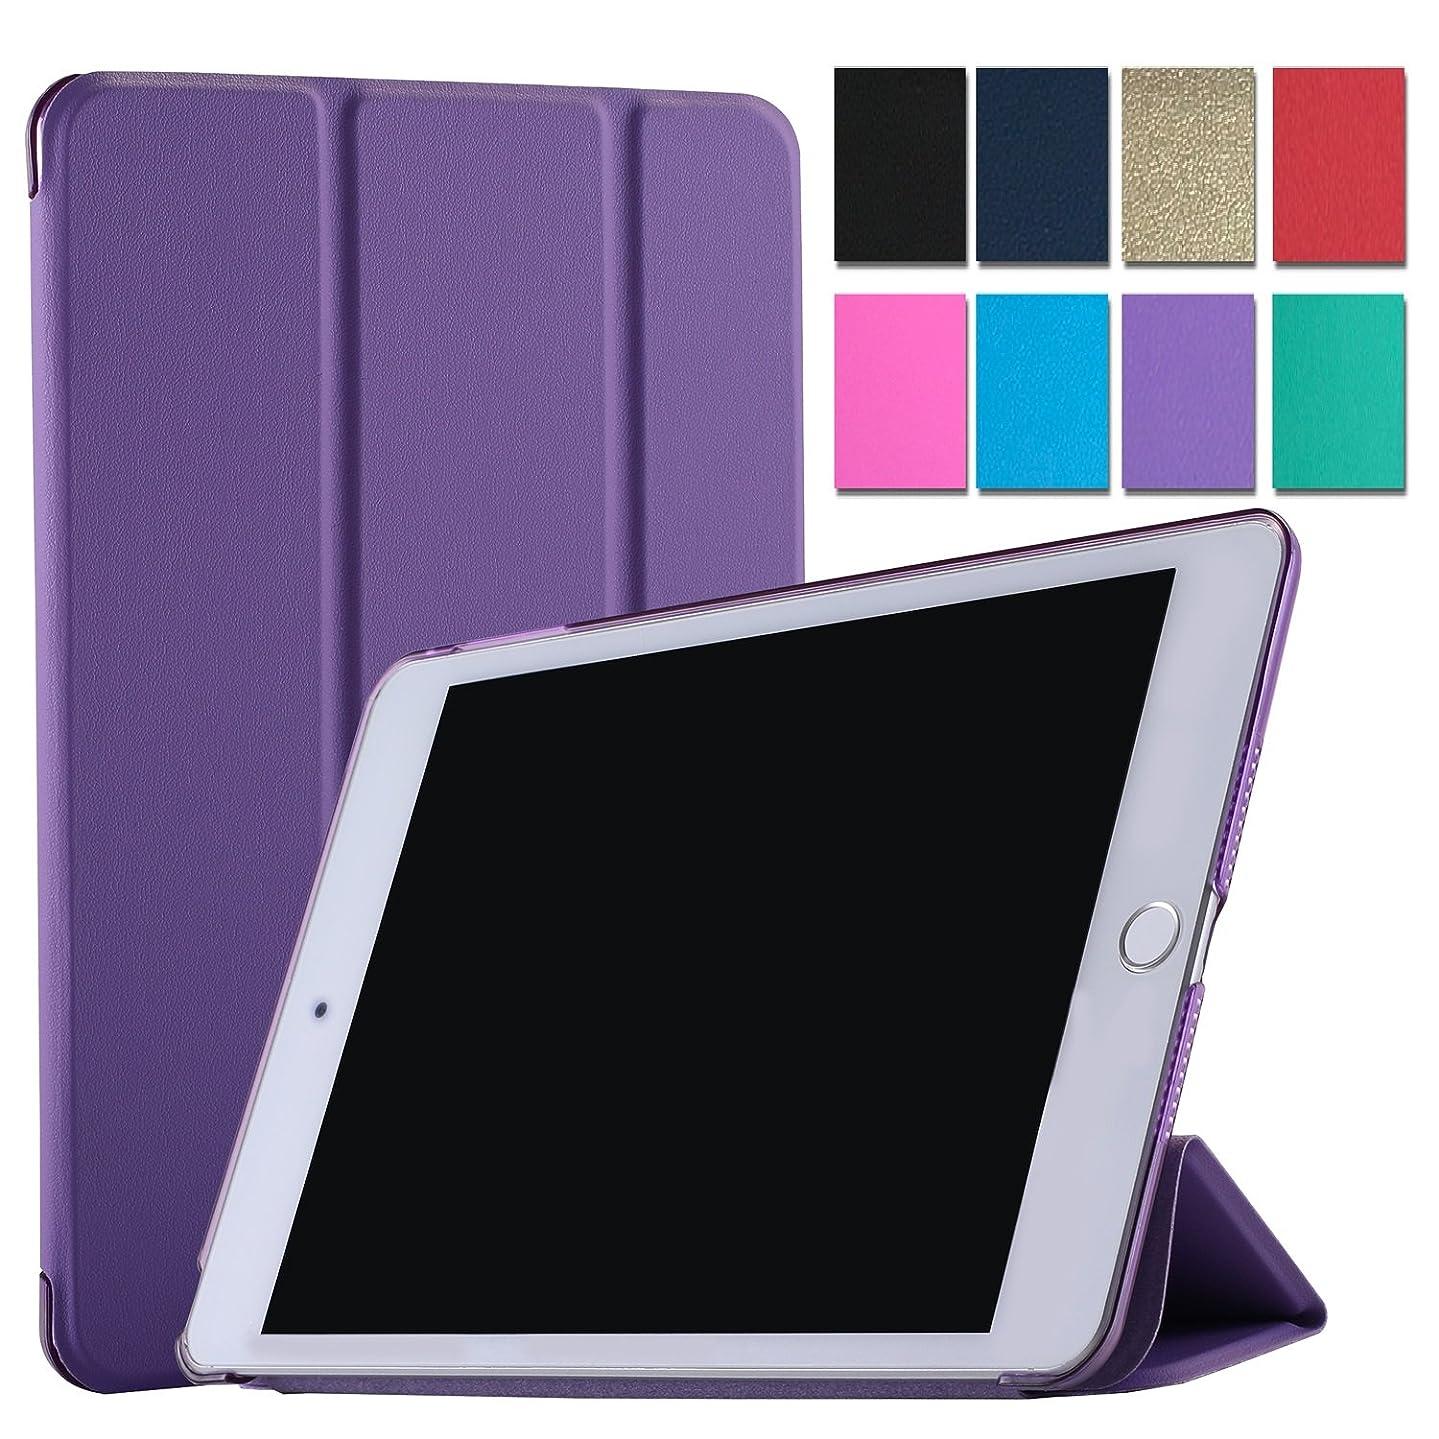 DuraSafe Case for iPad 4 / iPad 3 / iPad 2 9.7 Inch [ A1458 A1459 A1460 A1403 A1416 A1430 A1395 A1396 A1397 ] Tri Fold Smart Cover with Translucent Back, Auto Sleep/Wake - Purple